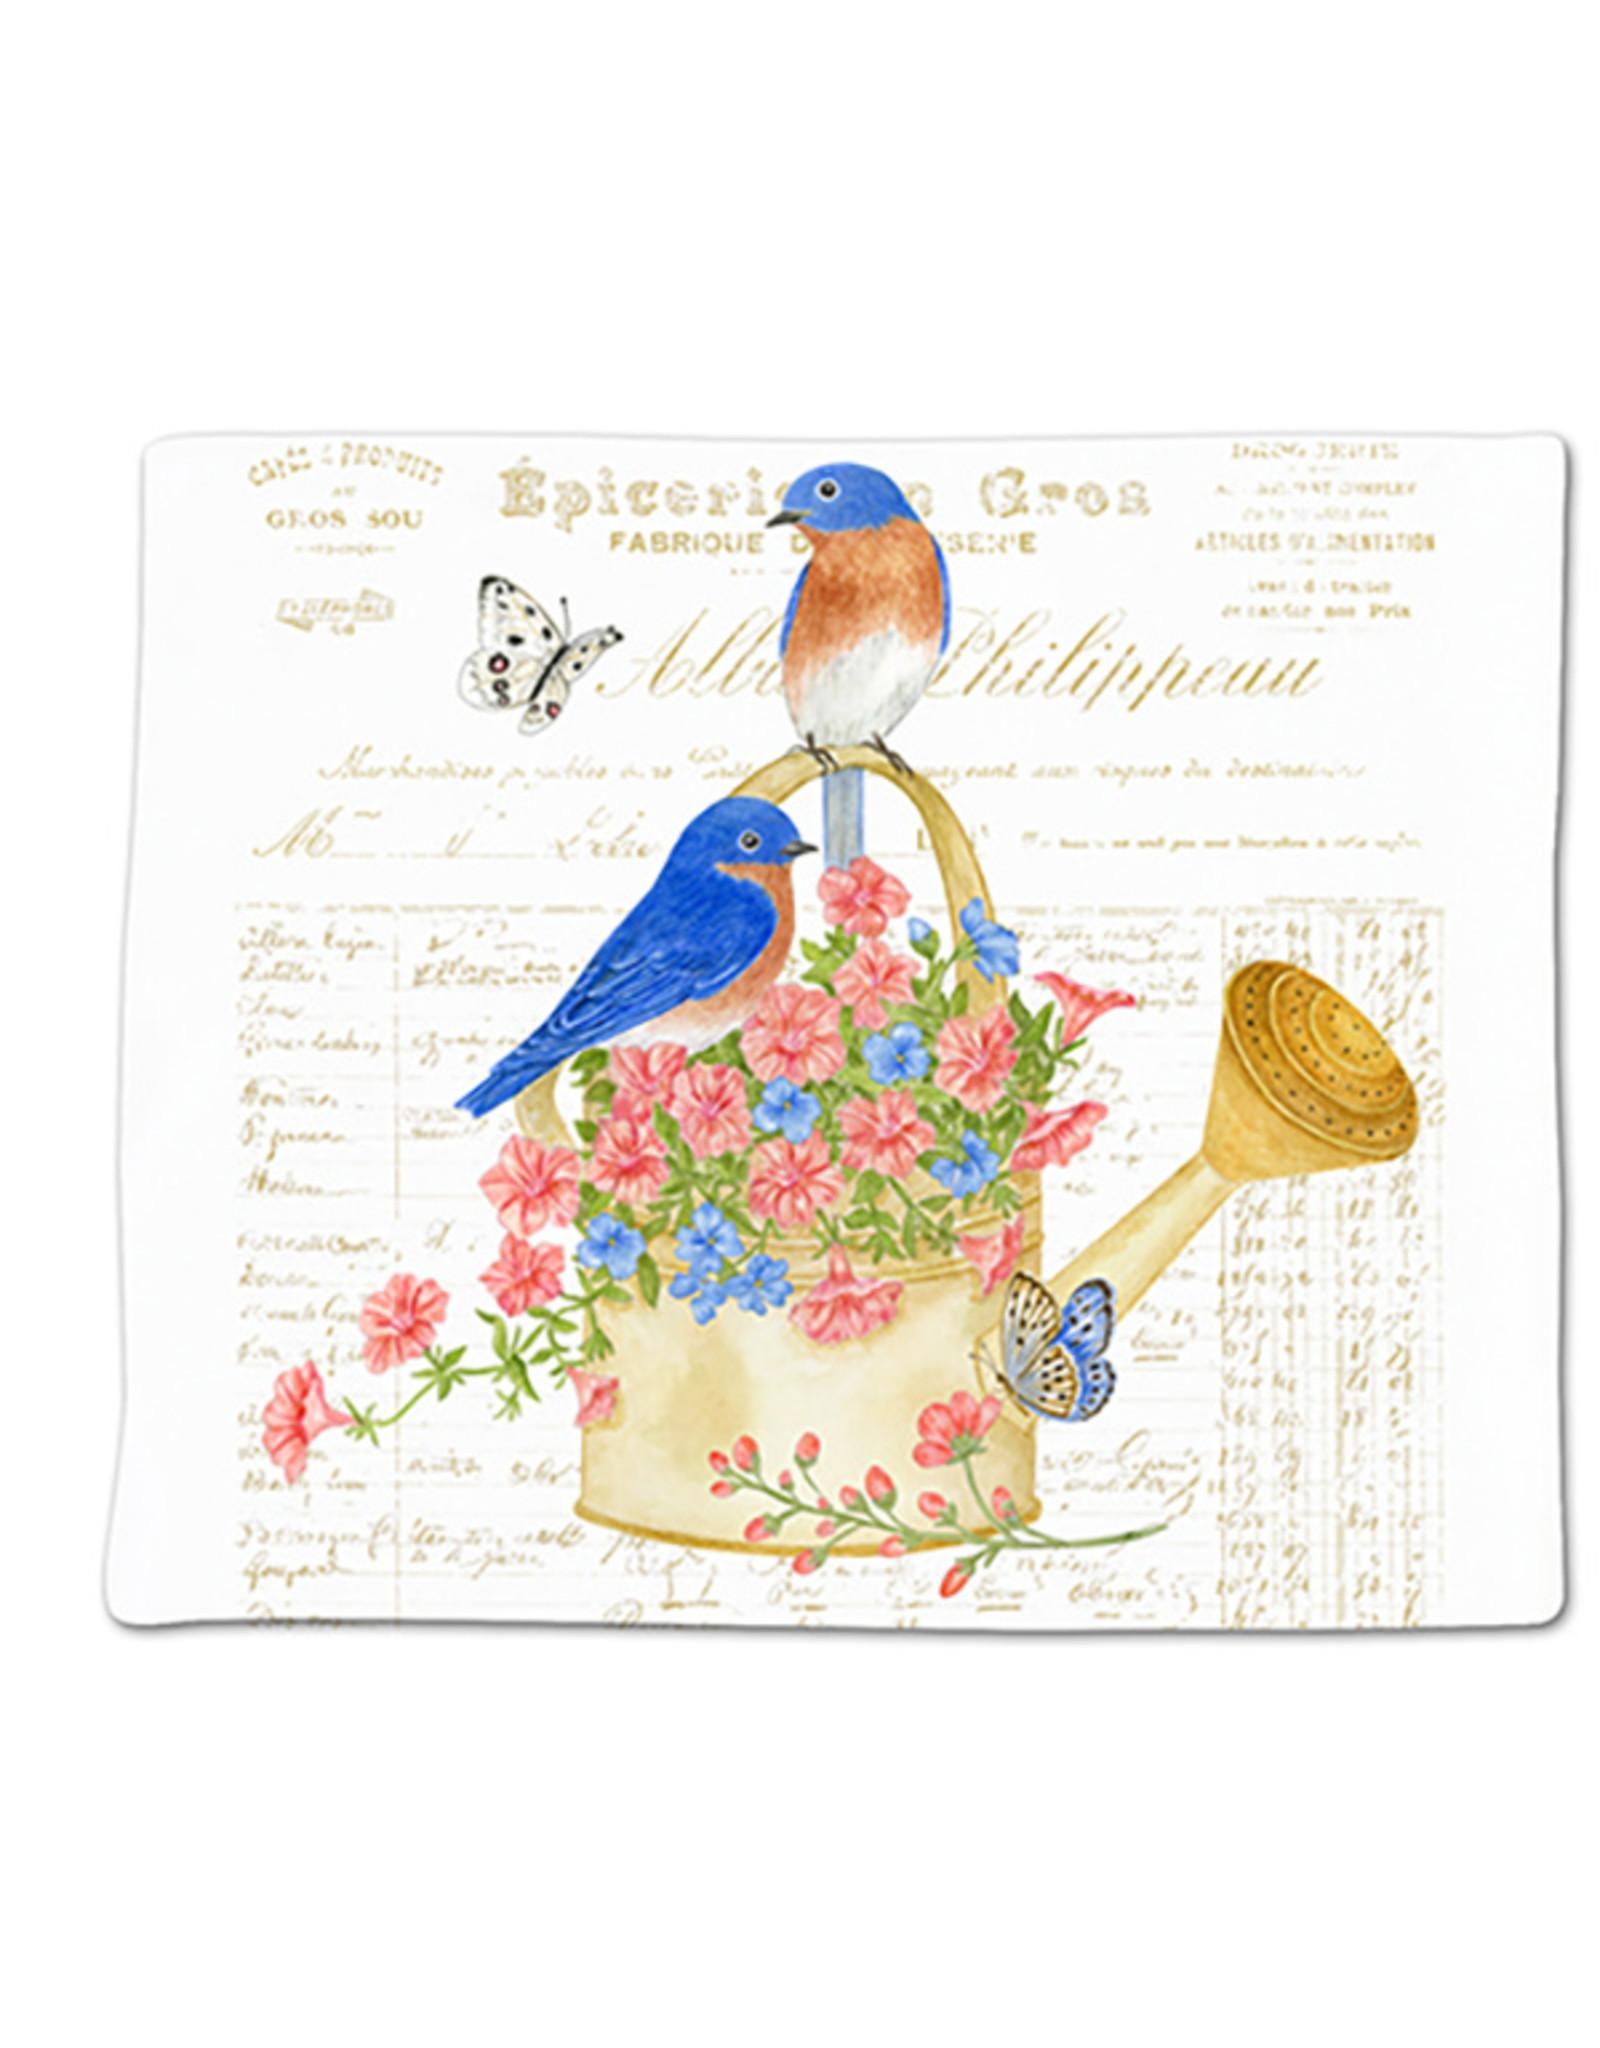 Alice's Cottage Flour Sack Towel, Single, Bluebirds, Made in USA, ACU34497